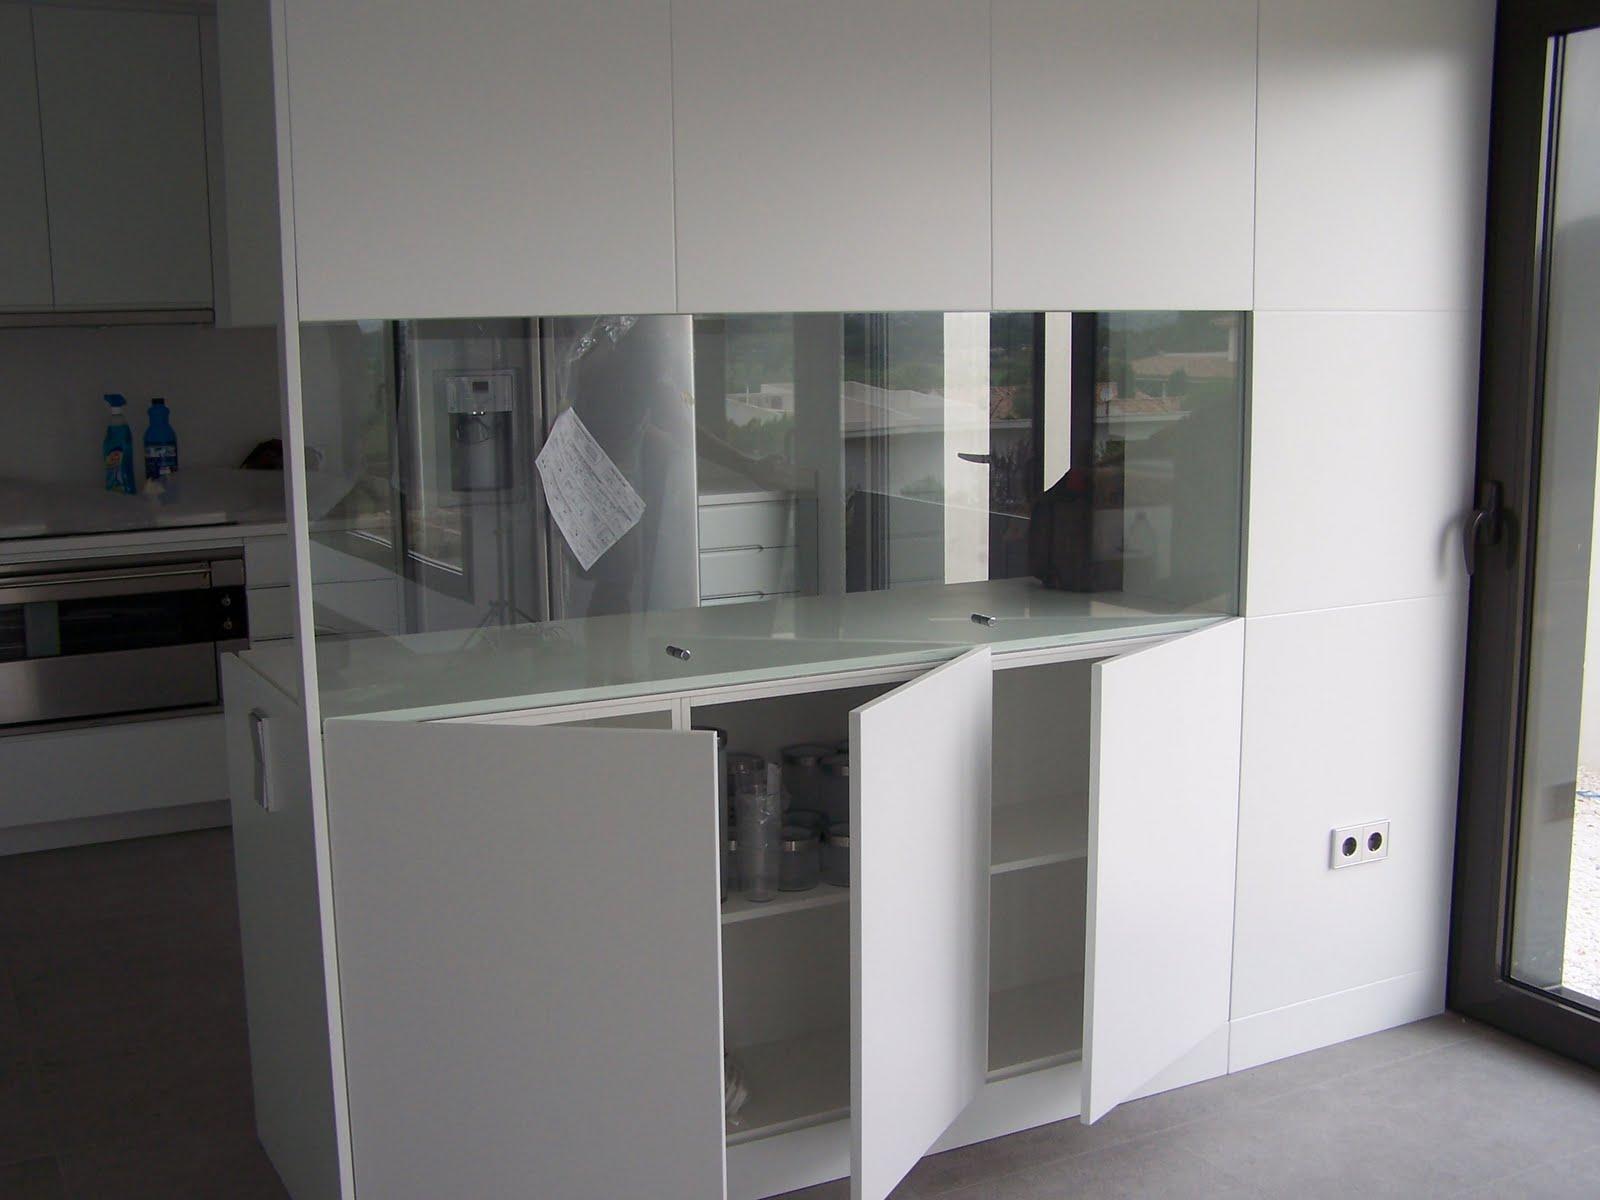 Carpinteria muebles a medida puerta guillotina en cristal - Puertas de cristal para cocinas ...